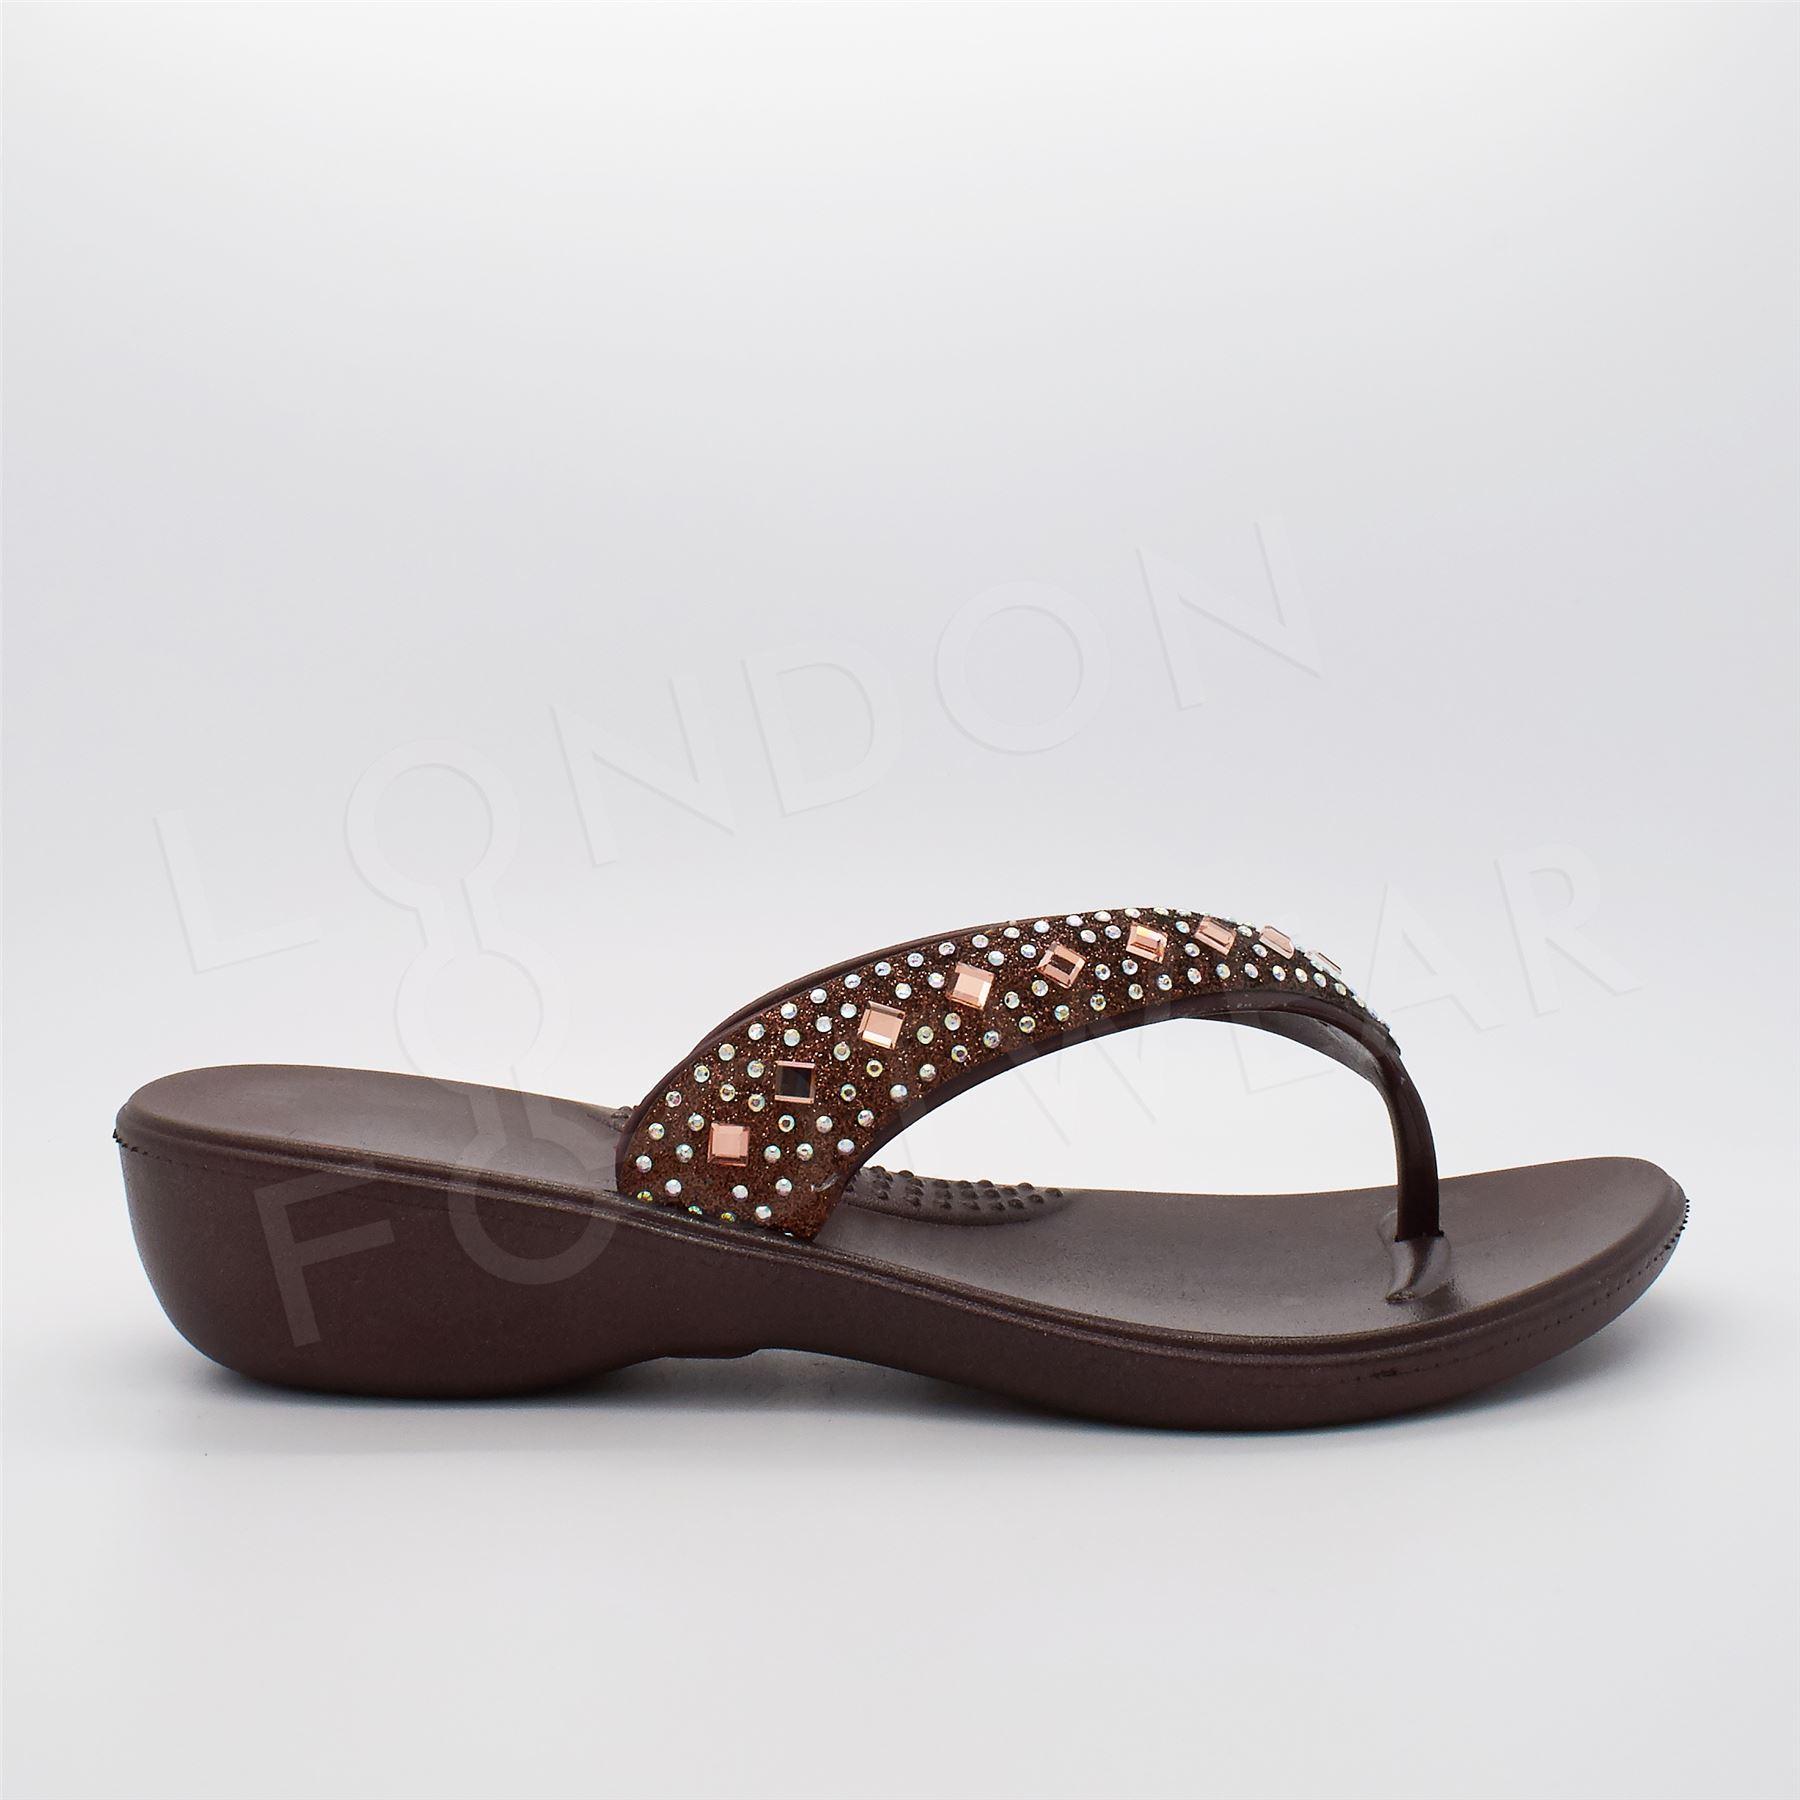 ladies diamante flip flops womens low wedge summer toe. Black Bedroom Furniture Sets. Home Design Ideas